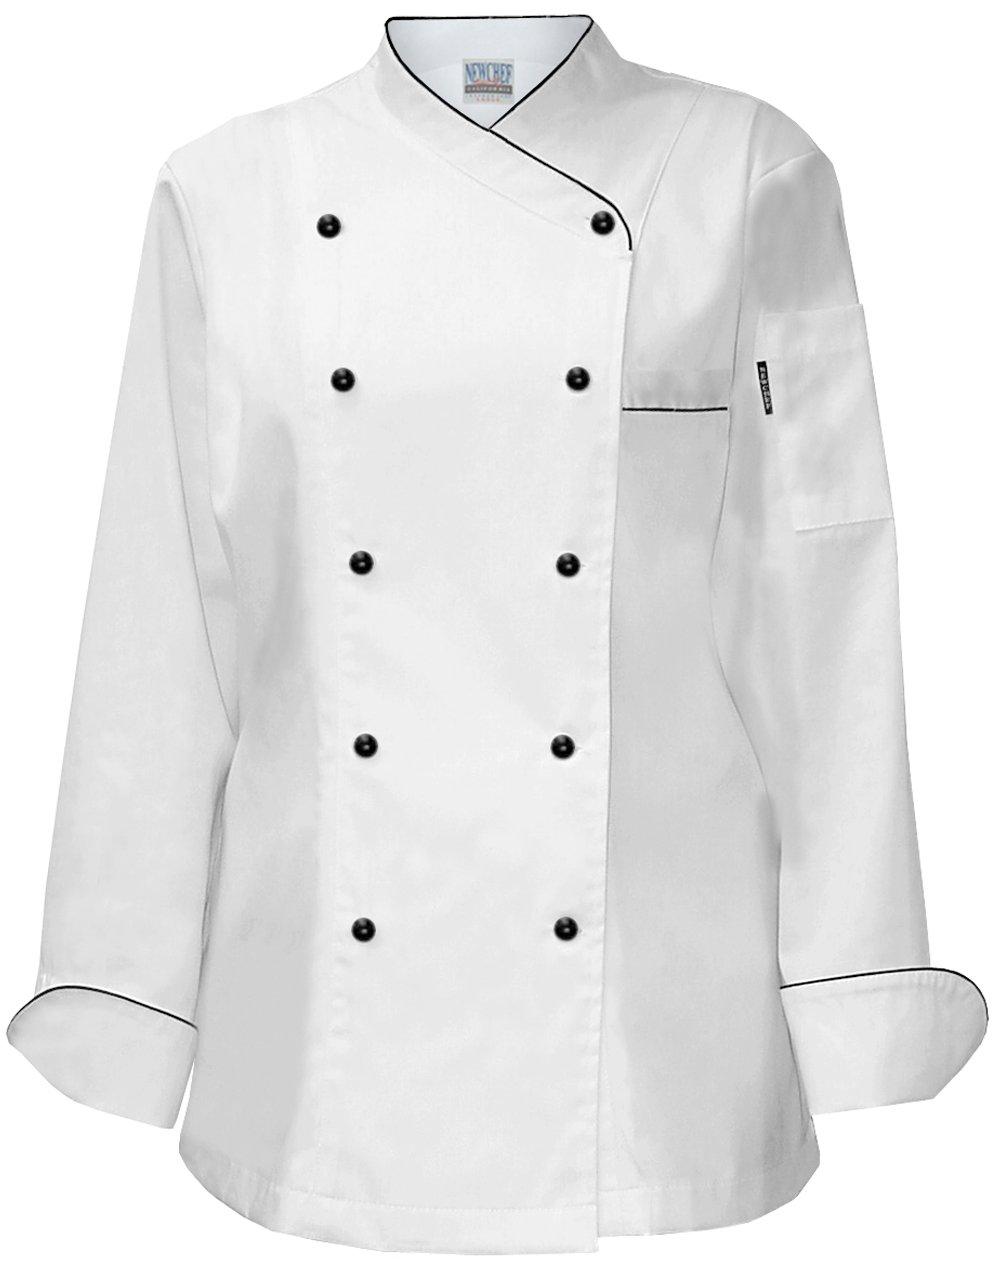 Newchef Fashion Lady Frenchy White Chef Coat with Black Trim S White